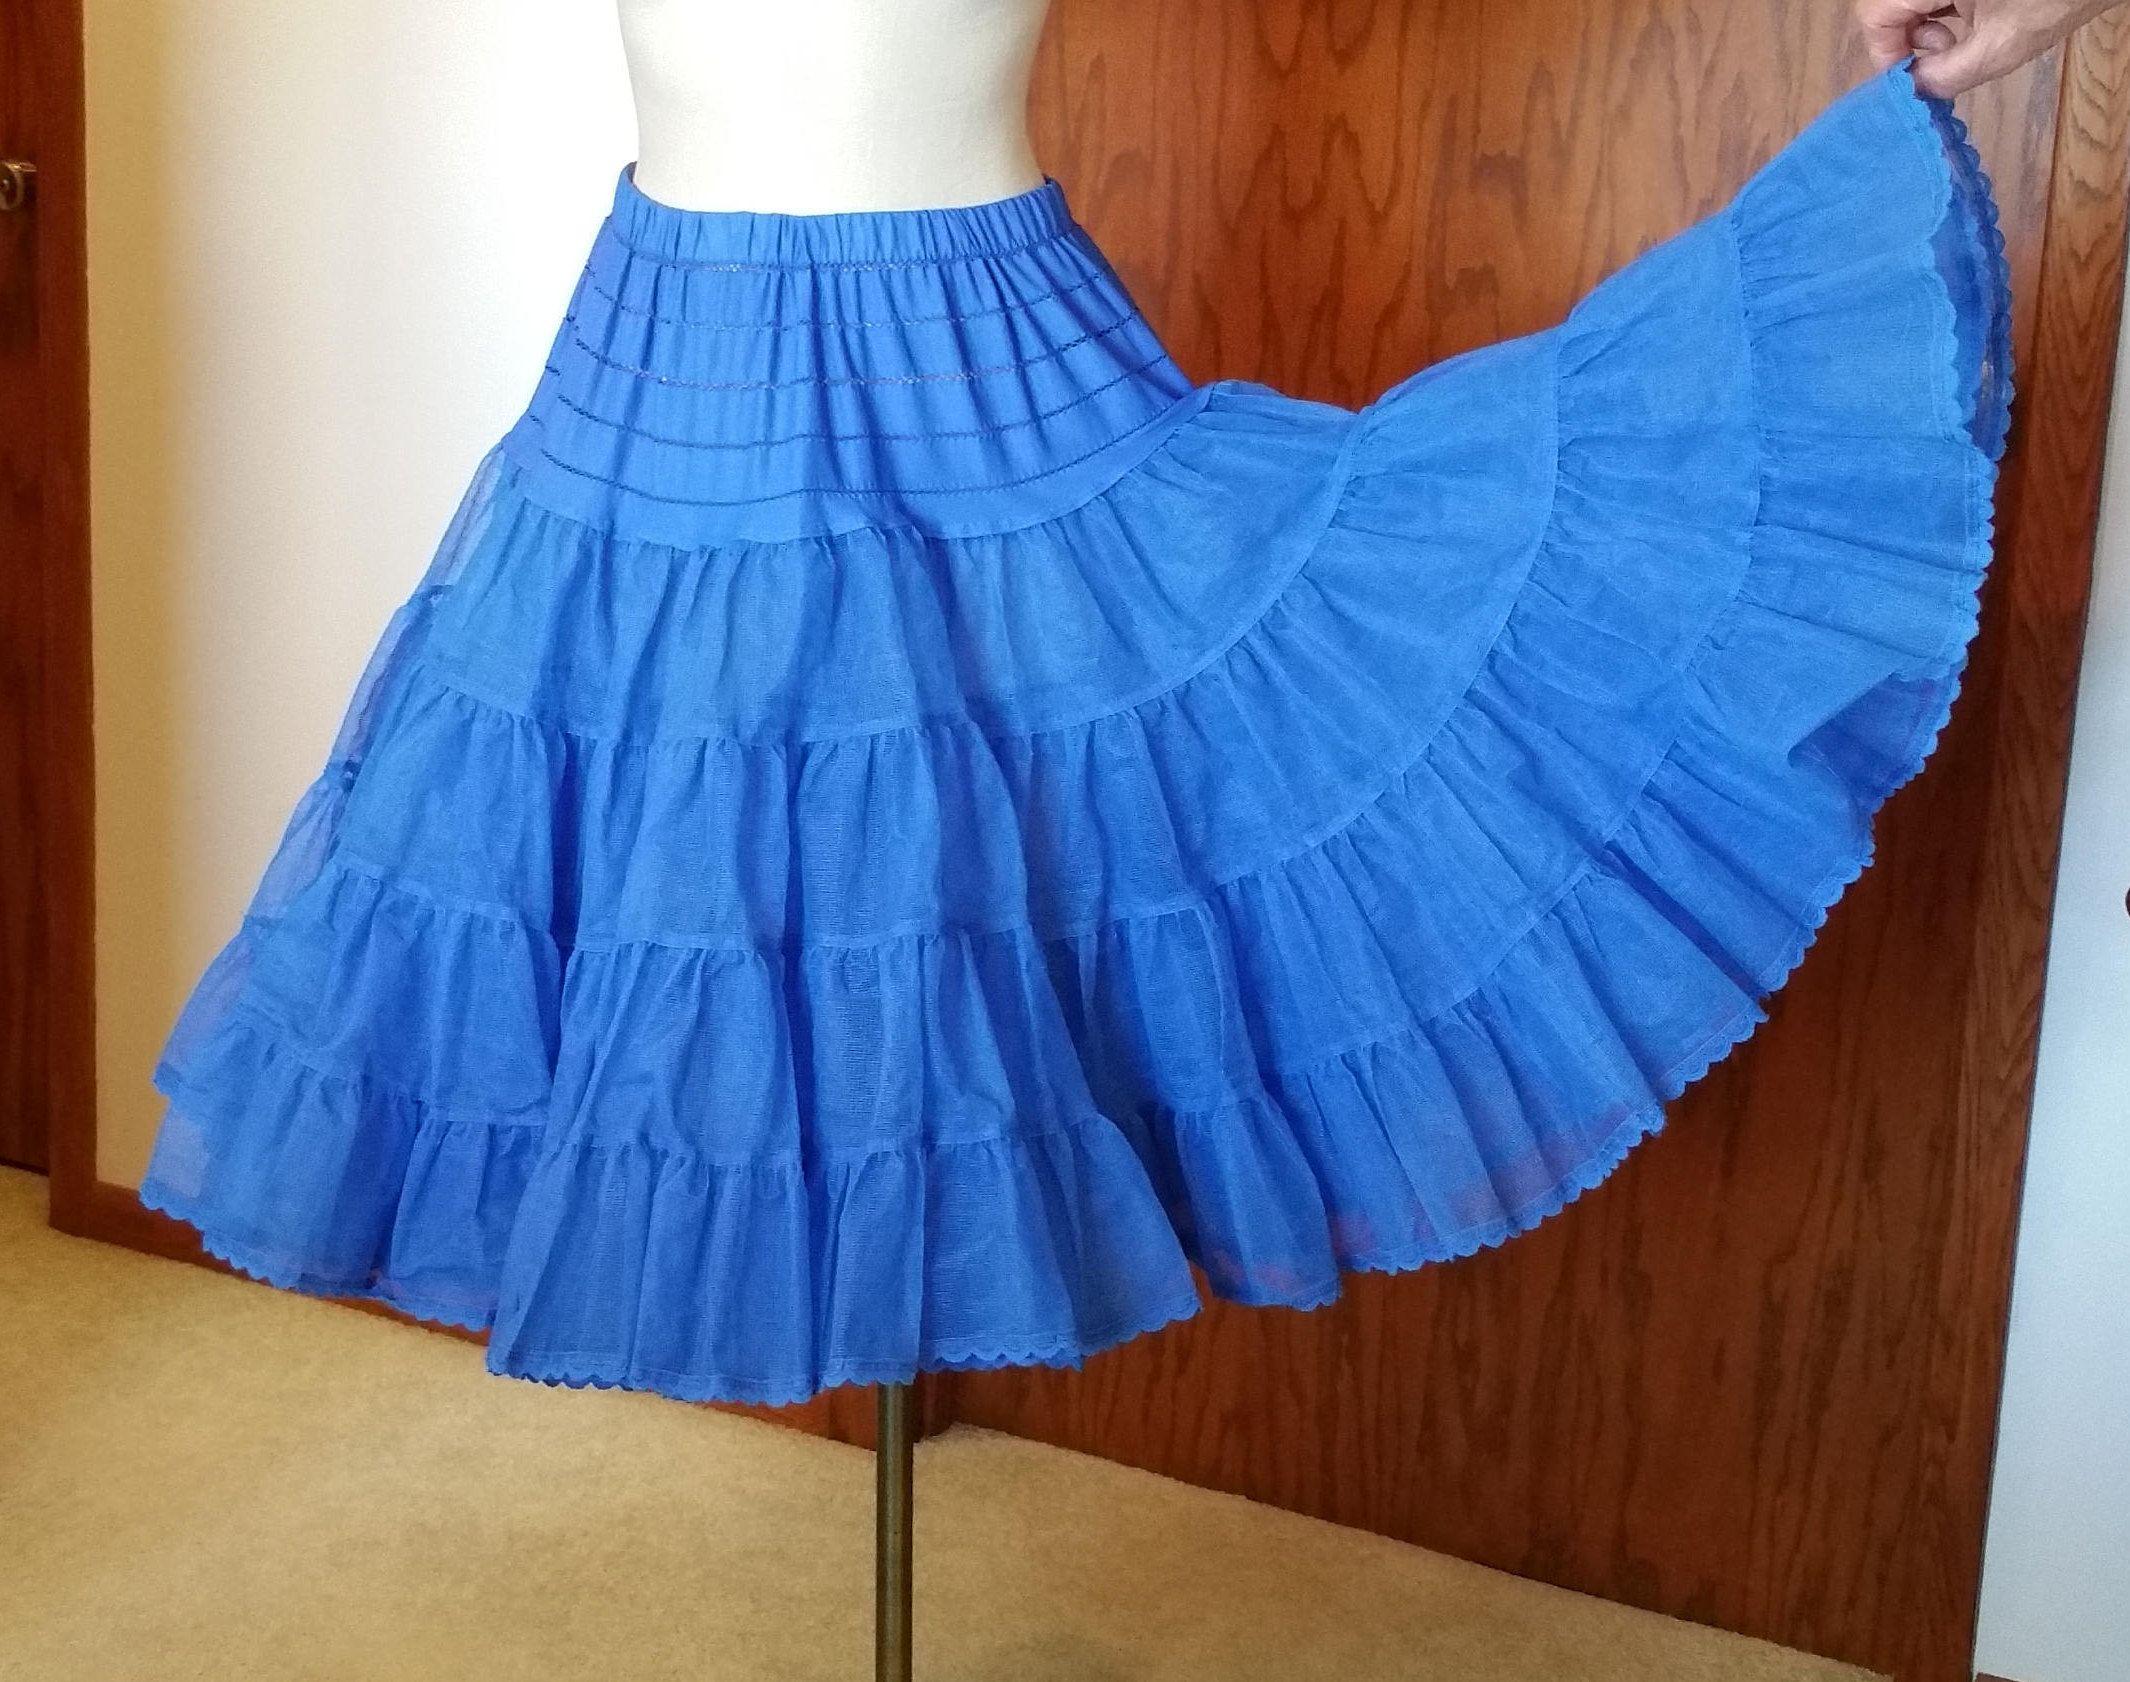 Retro Tutu Rockabilly Vintage Square Dancing Cobalt Crinoline Full Slip with Ribbon Trim Royal Blue Petticoat